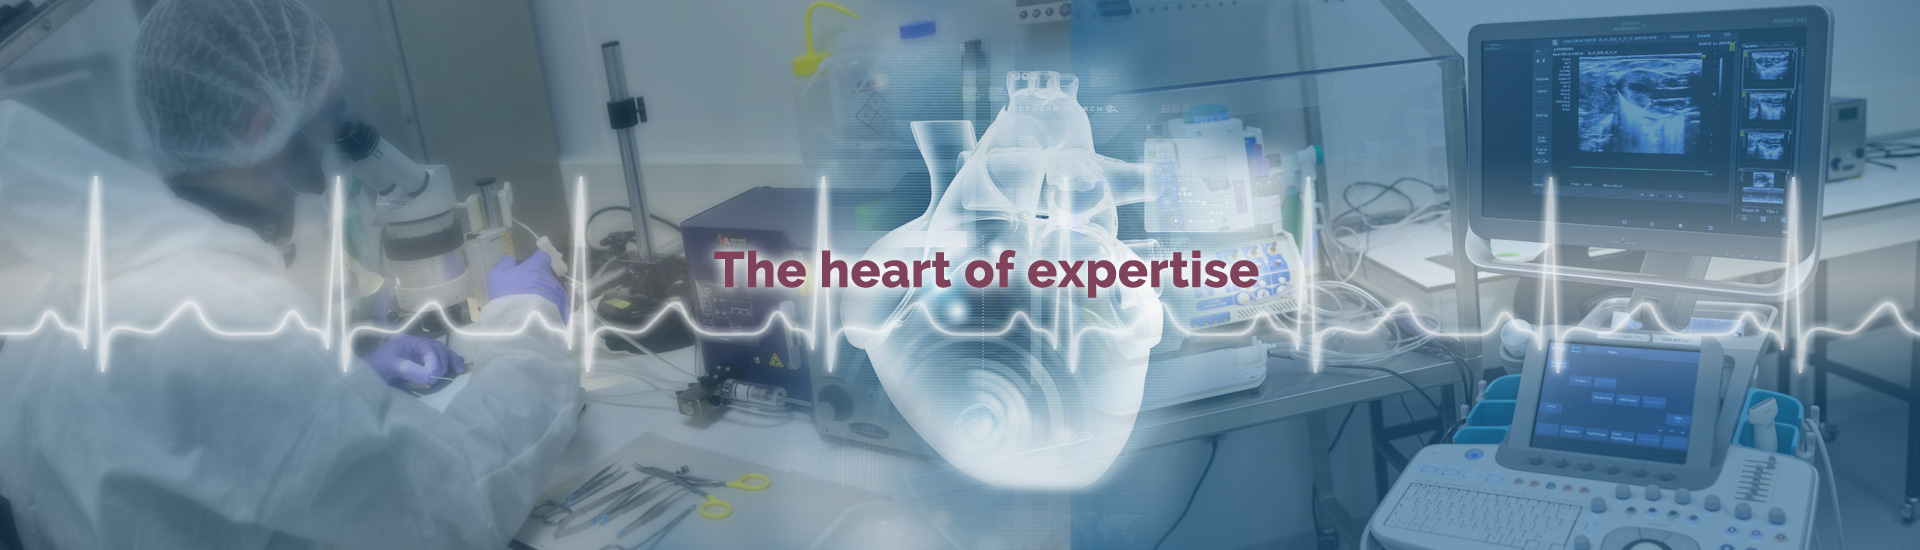 slide-cardiomedex-cardiovascular-desease